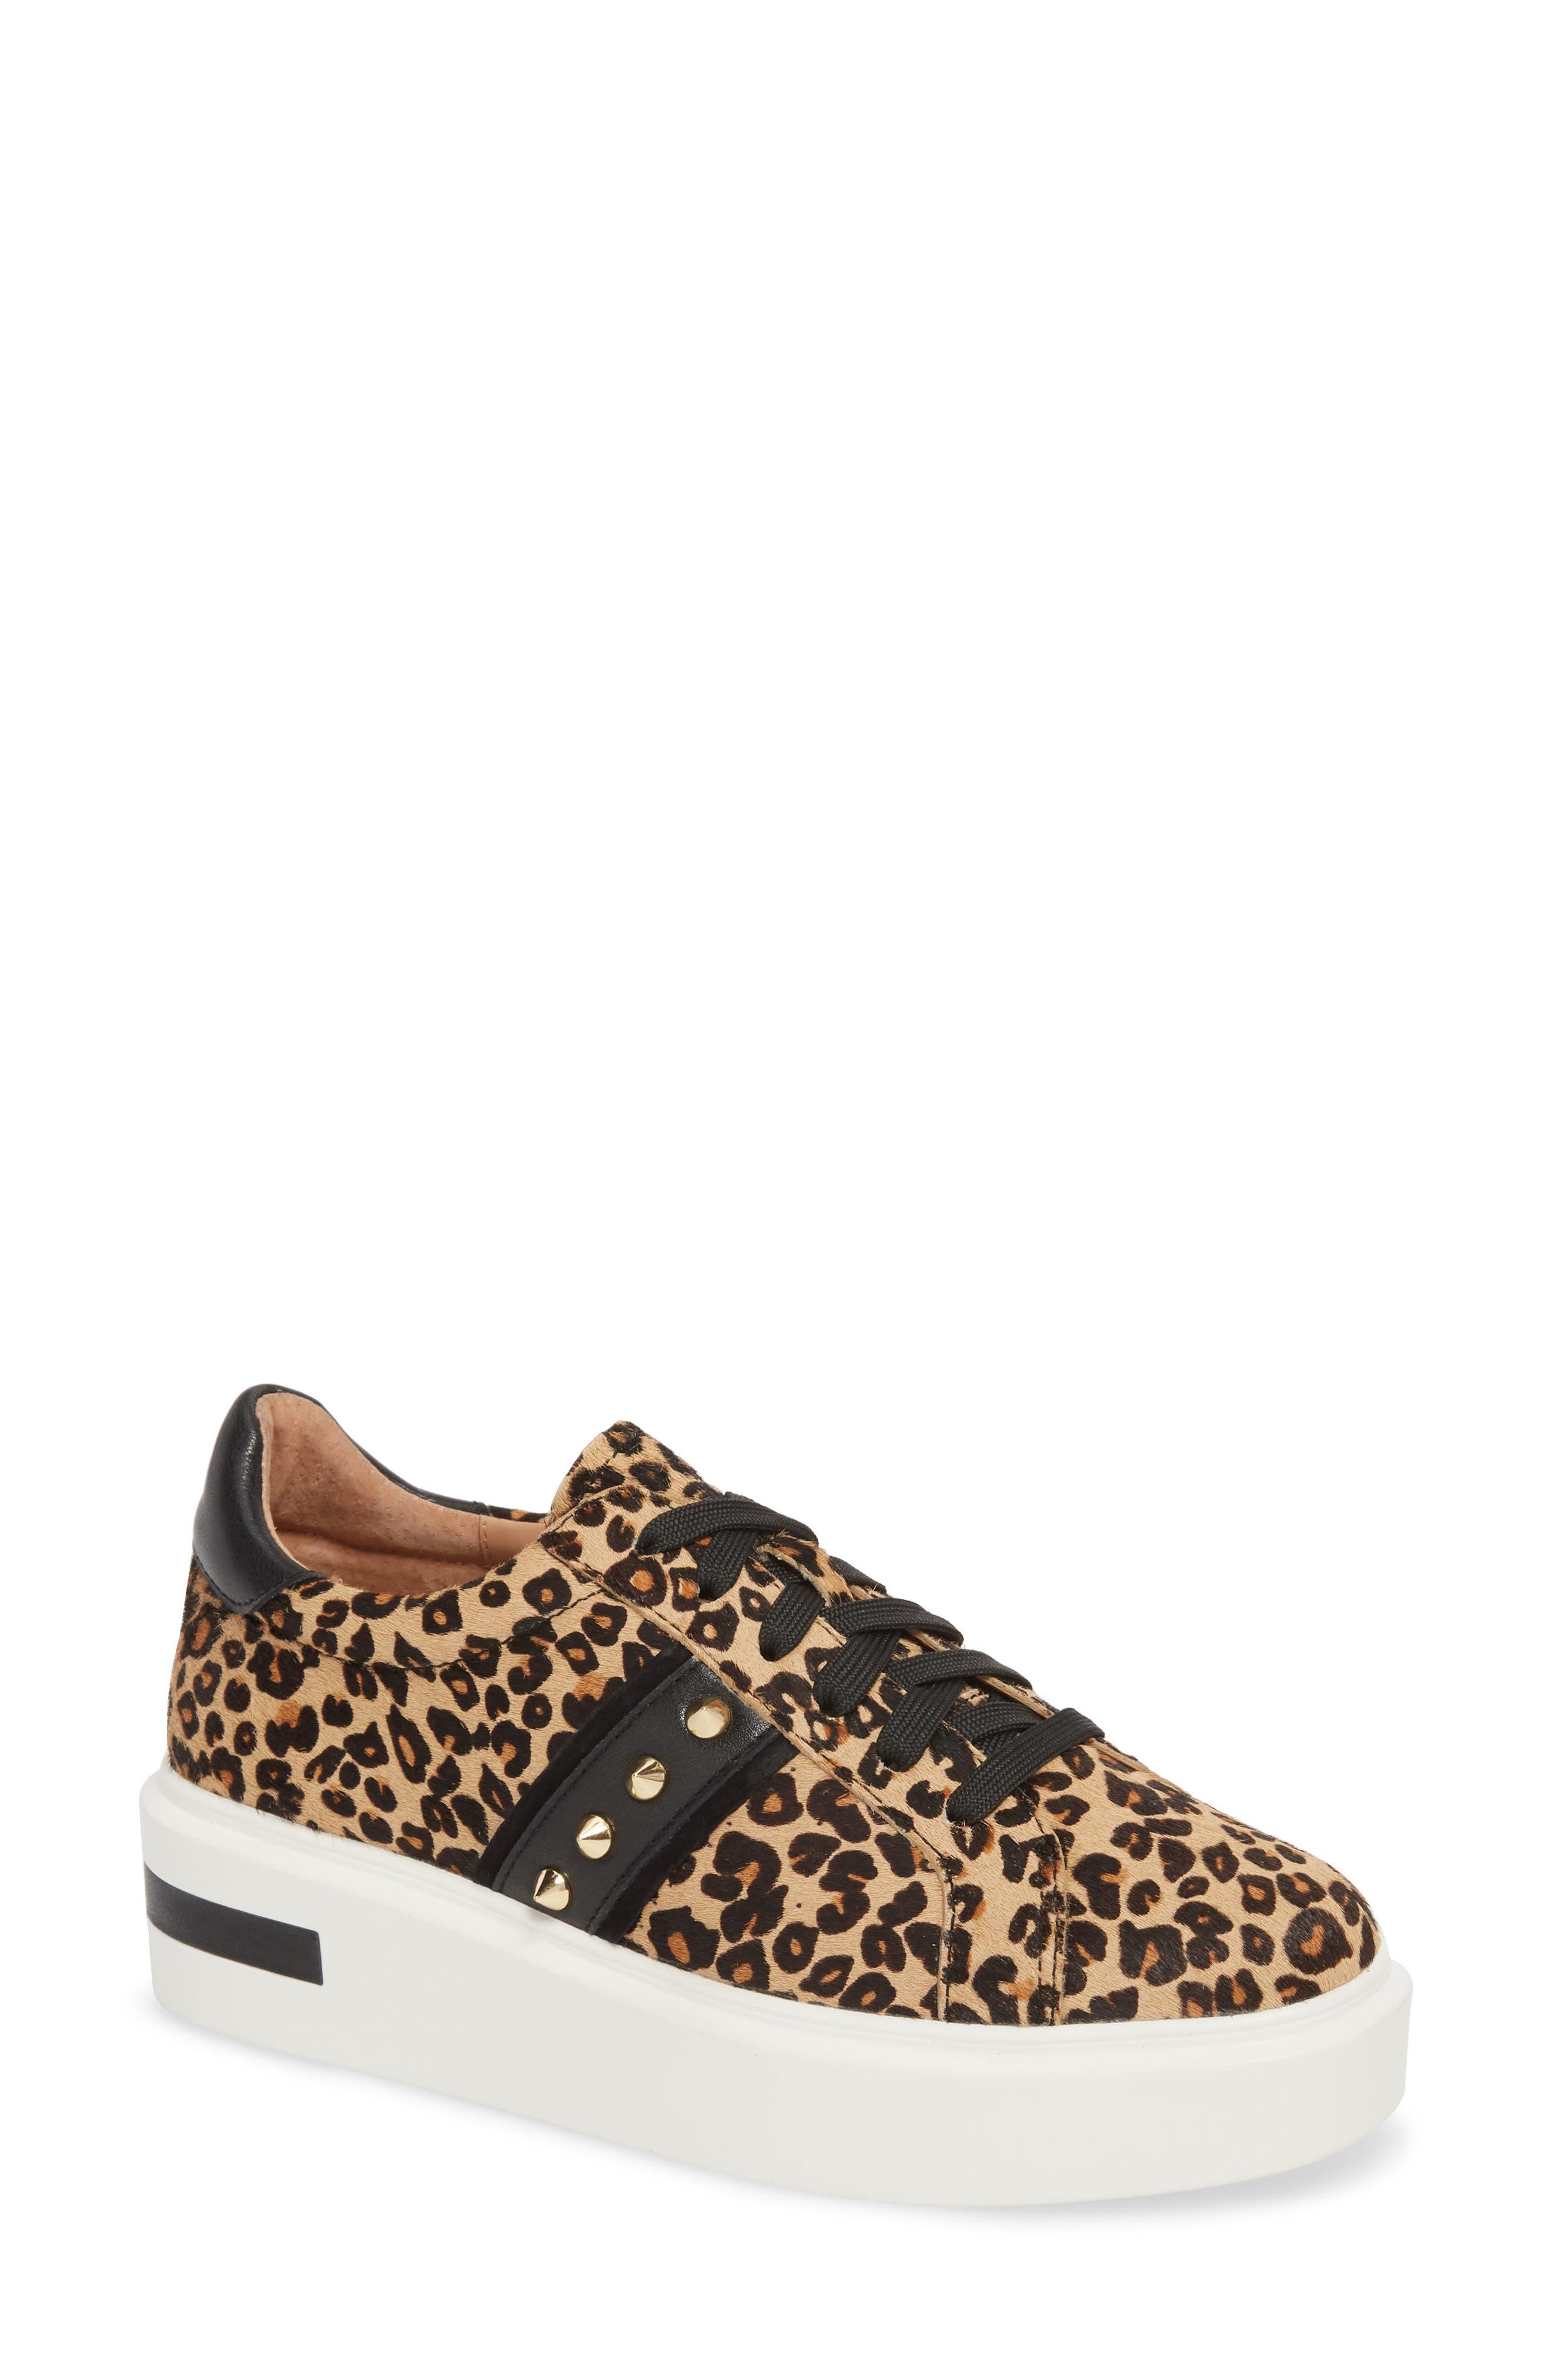 LINEA PAOLO Knox II Platform Genuine Calf Hair Sneaker, Main, color, LEOPARD PRINT HAIR CALF